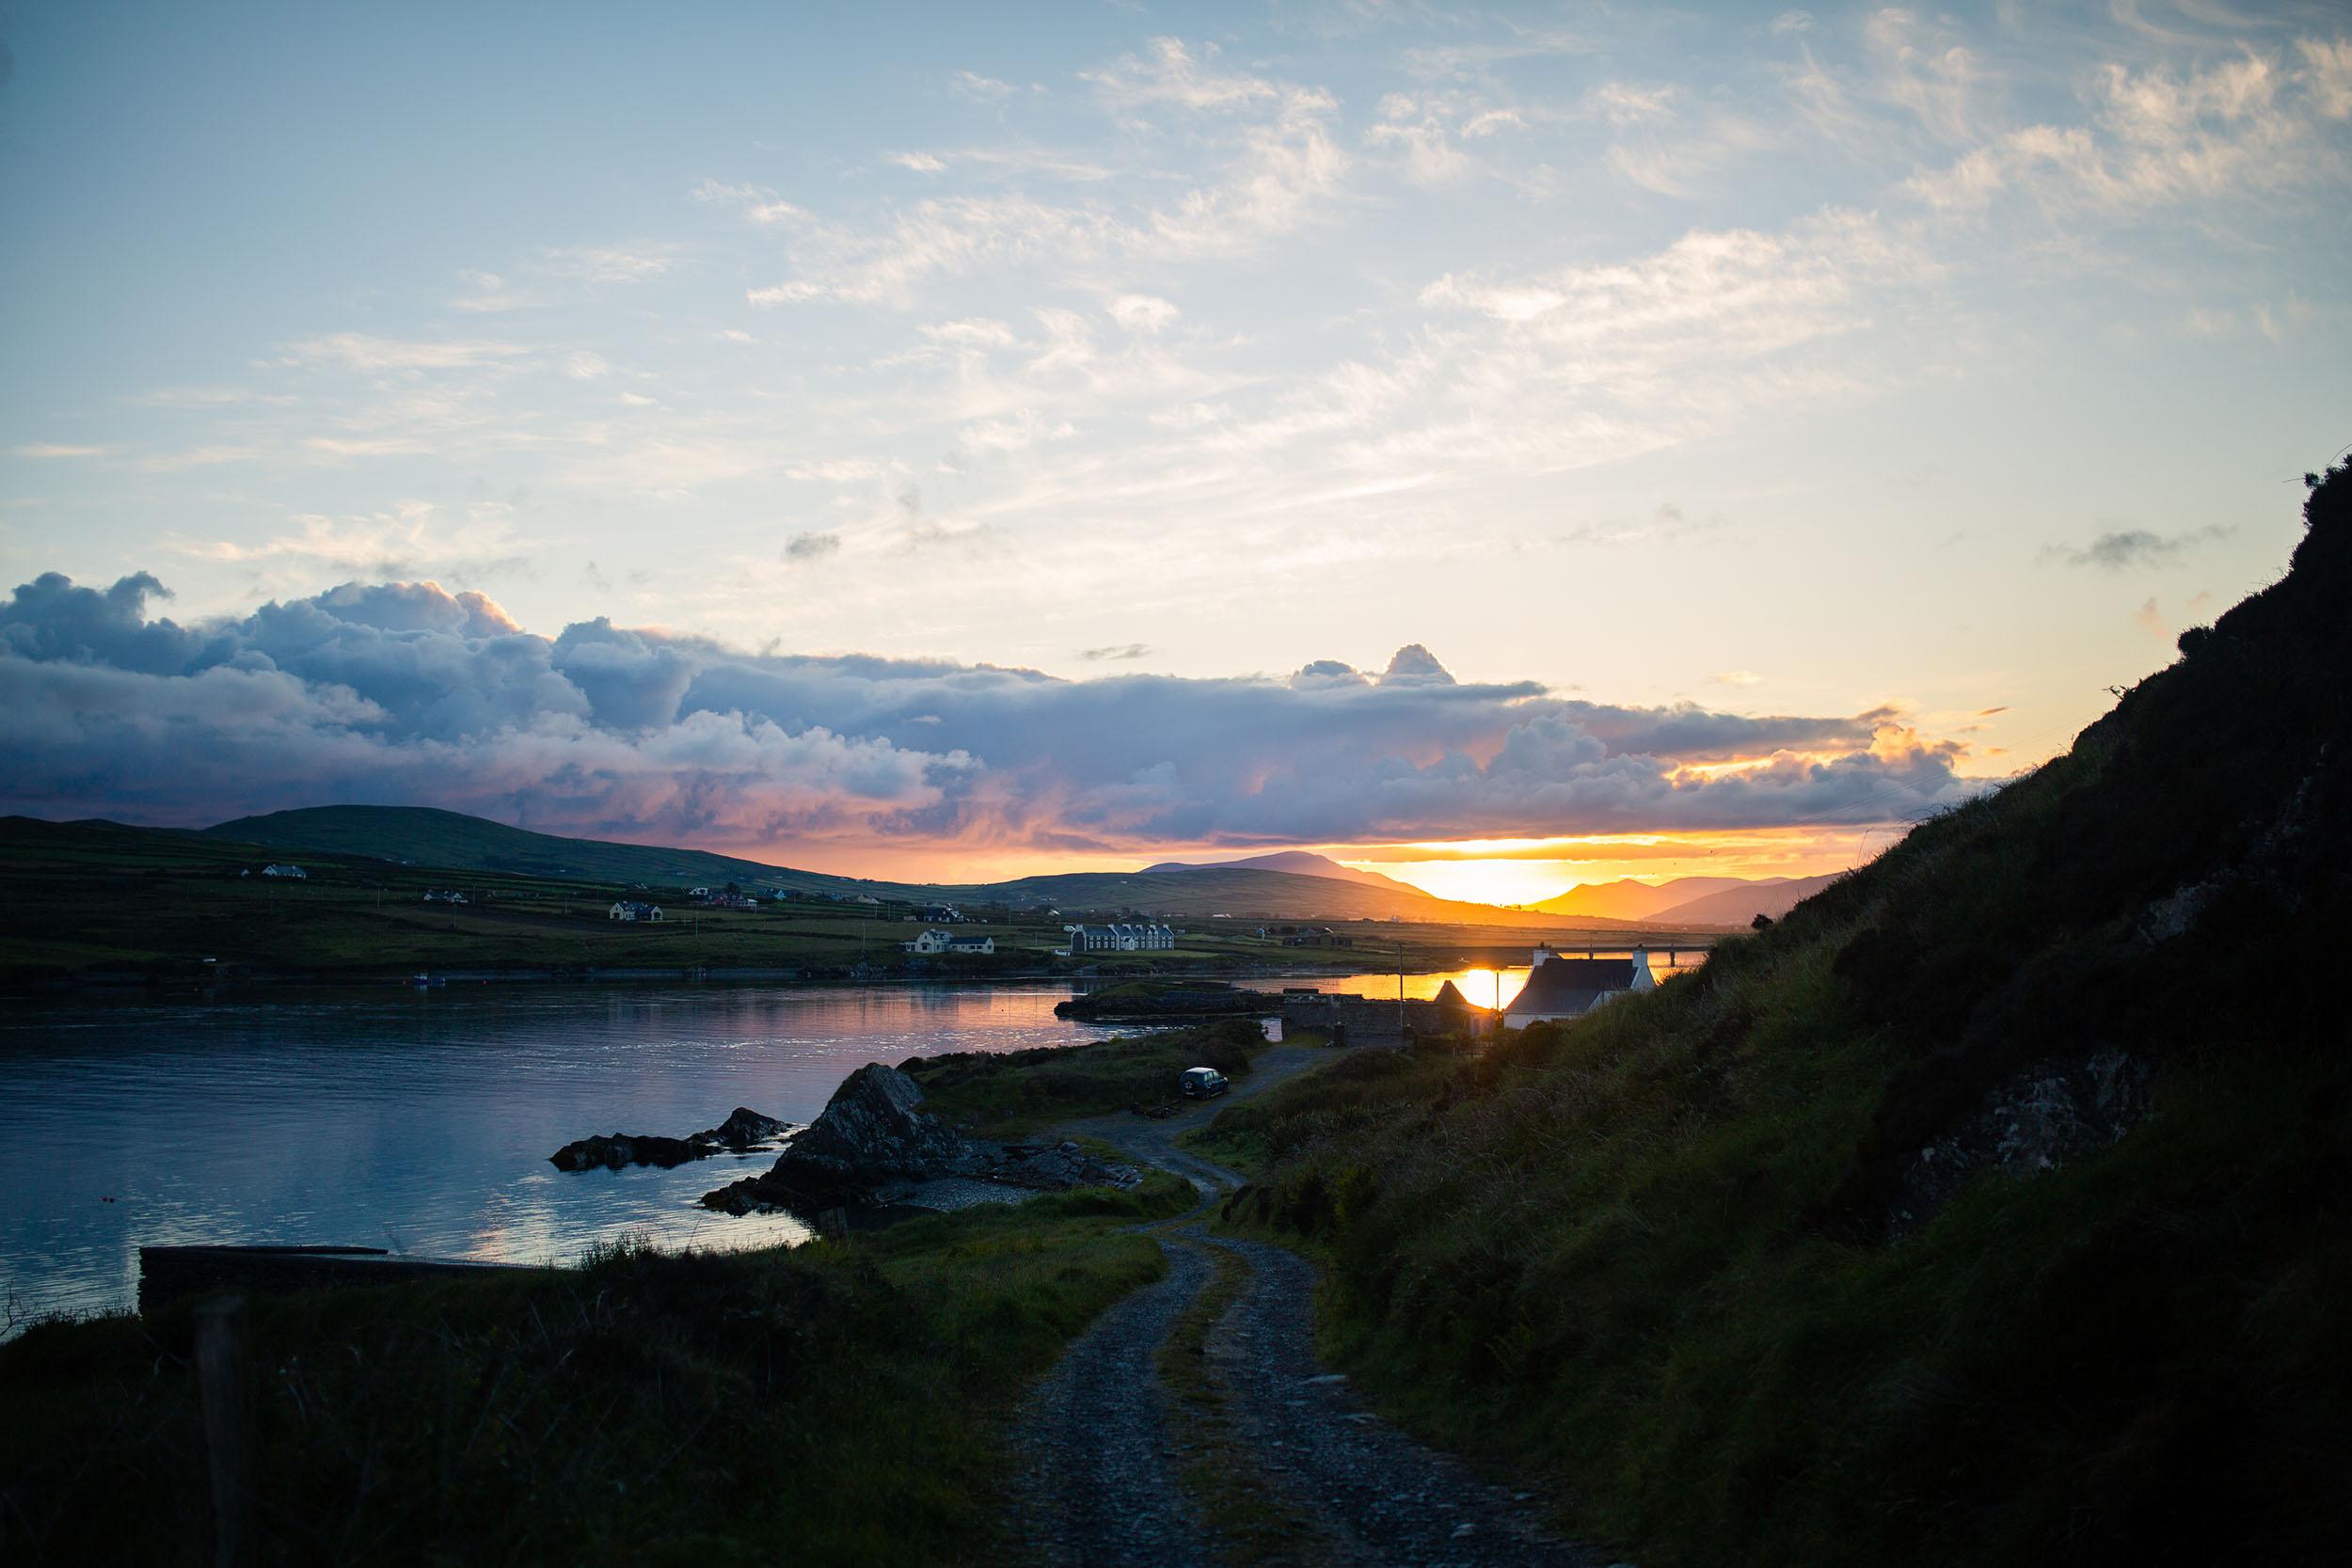 IRELAND_KERRY_PORTMAGEE_0007